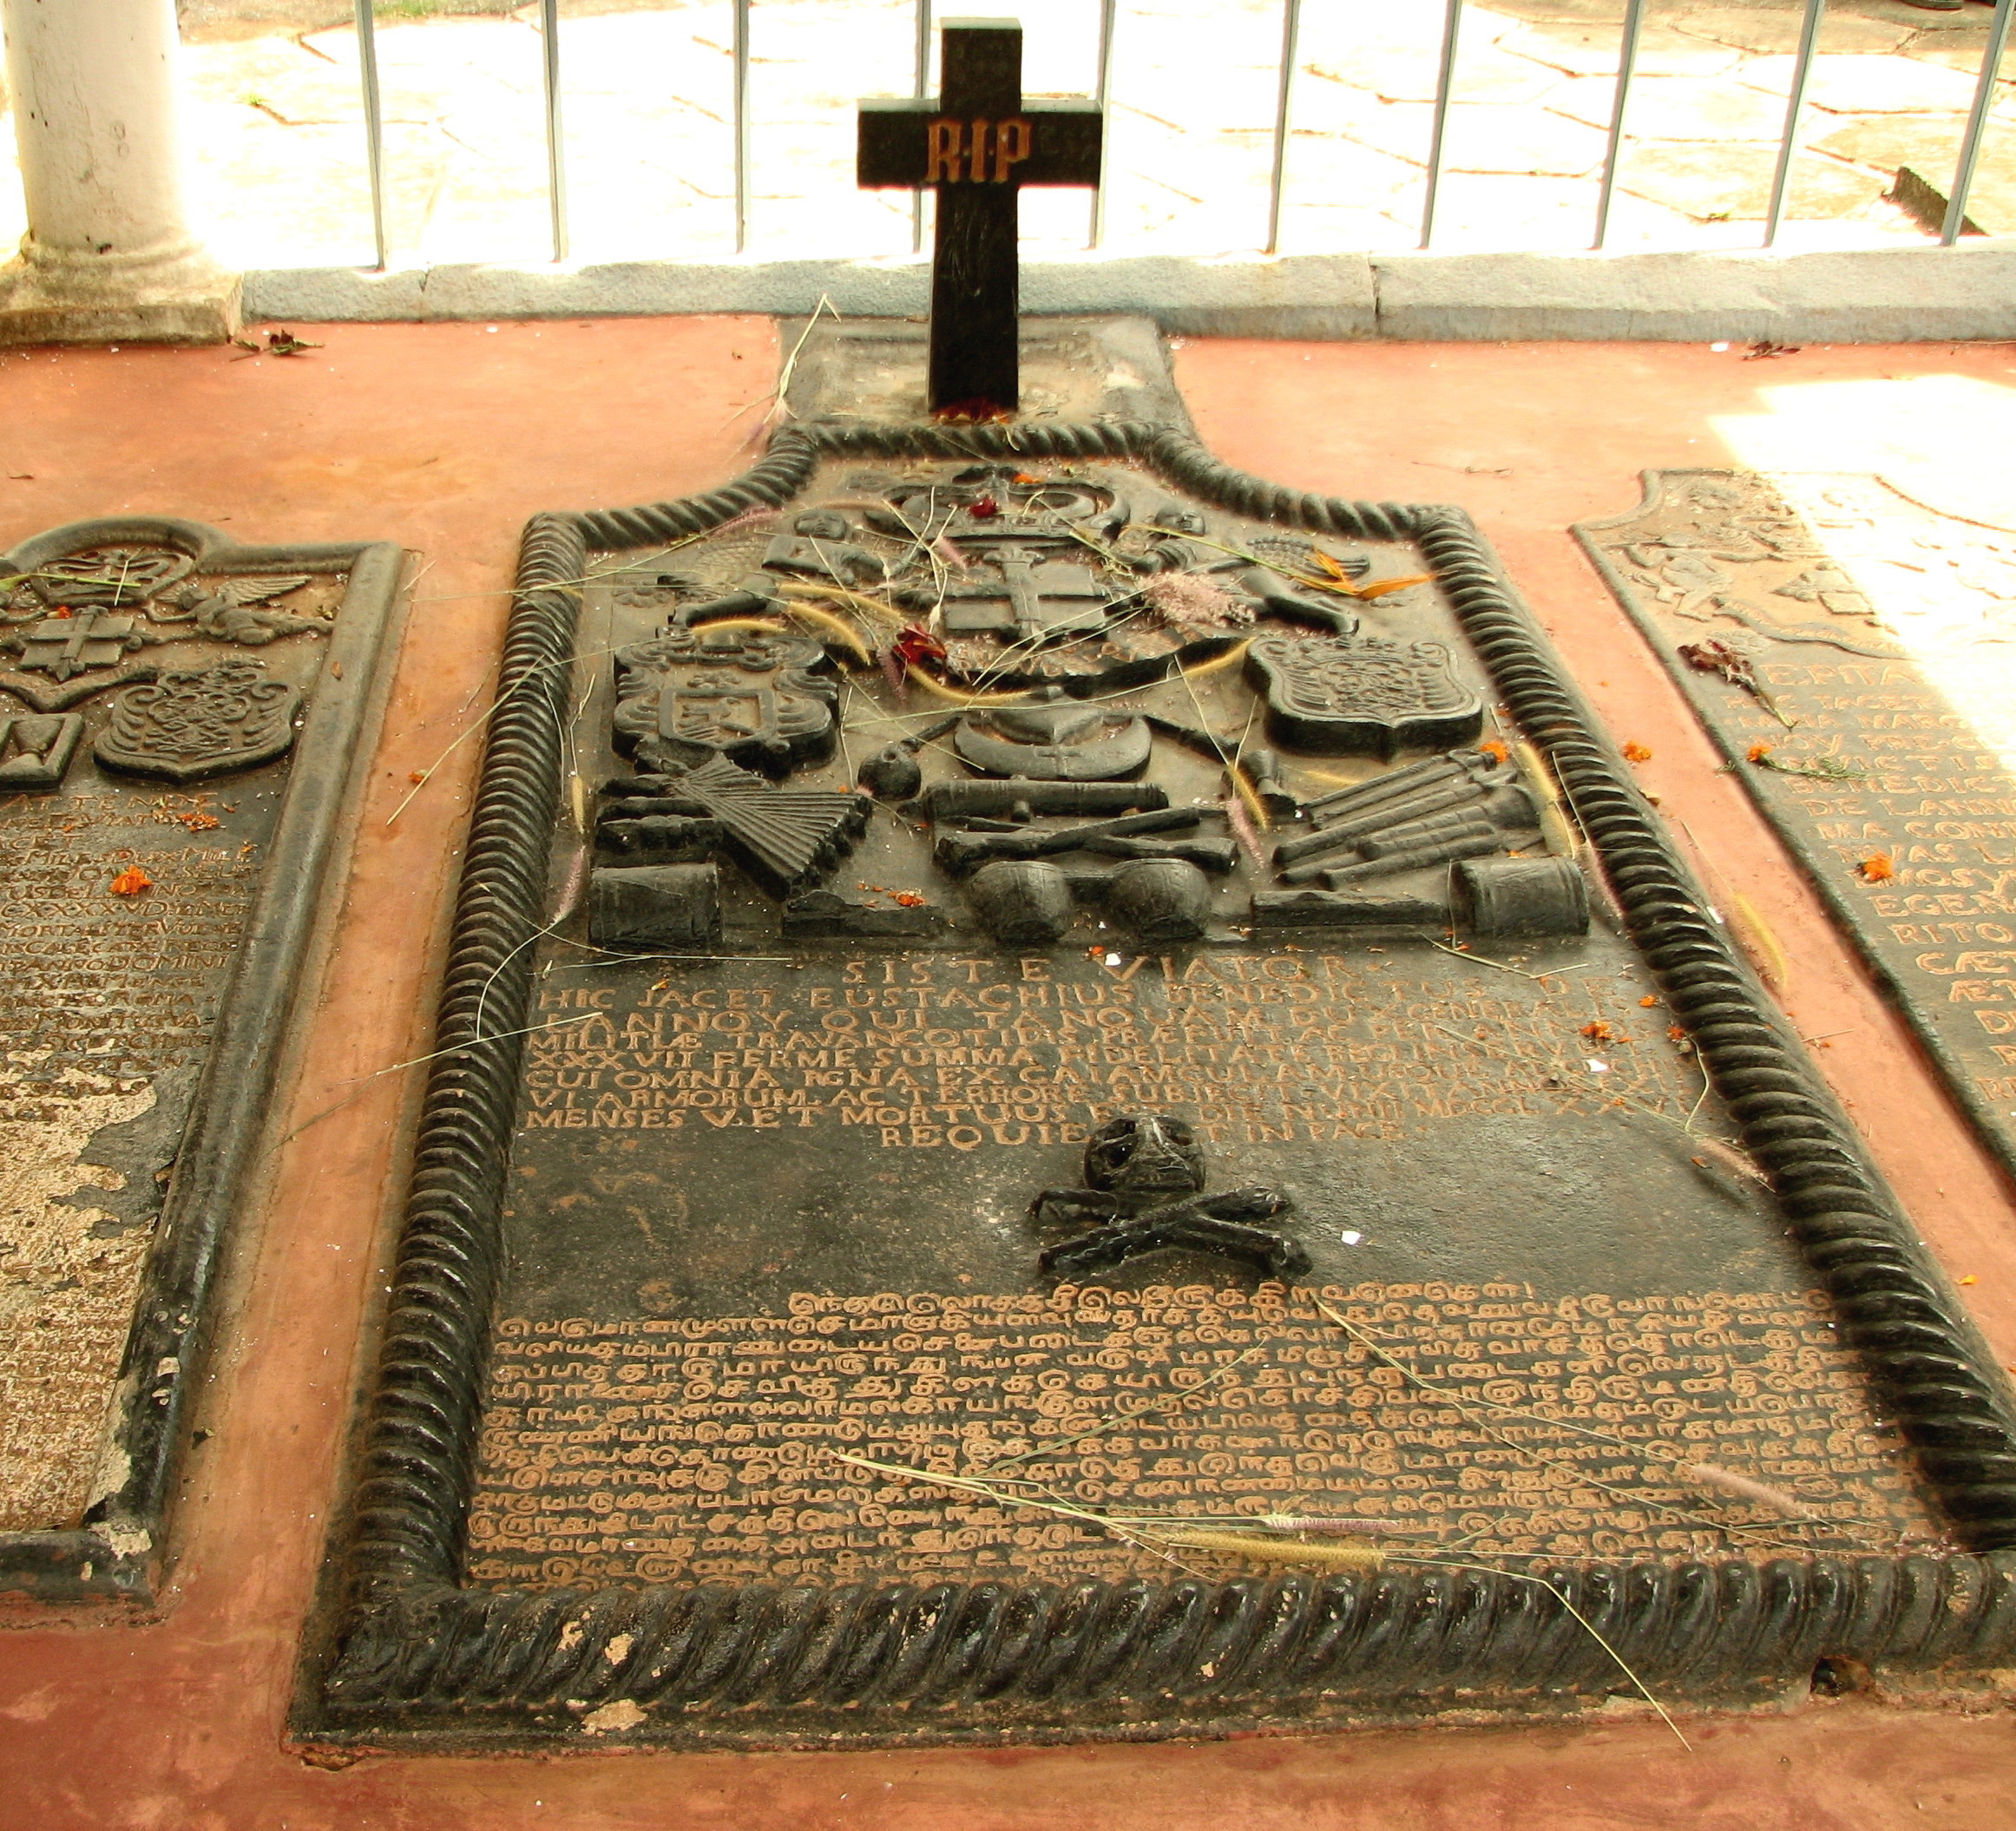 https://i2.wp.com/upload.wikimedia.org/wikipedia/commons/6/6b/De_lannoy_Tomb_-_Burial_Site.JPG